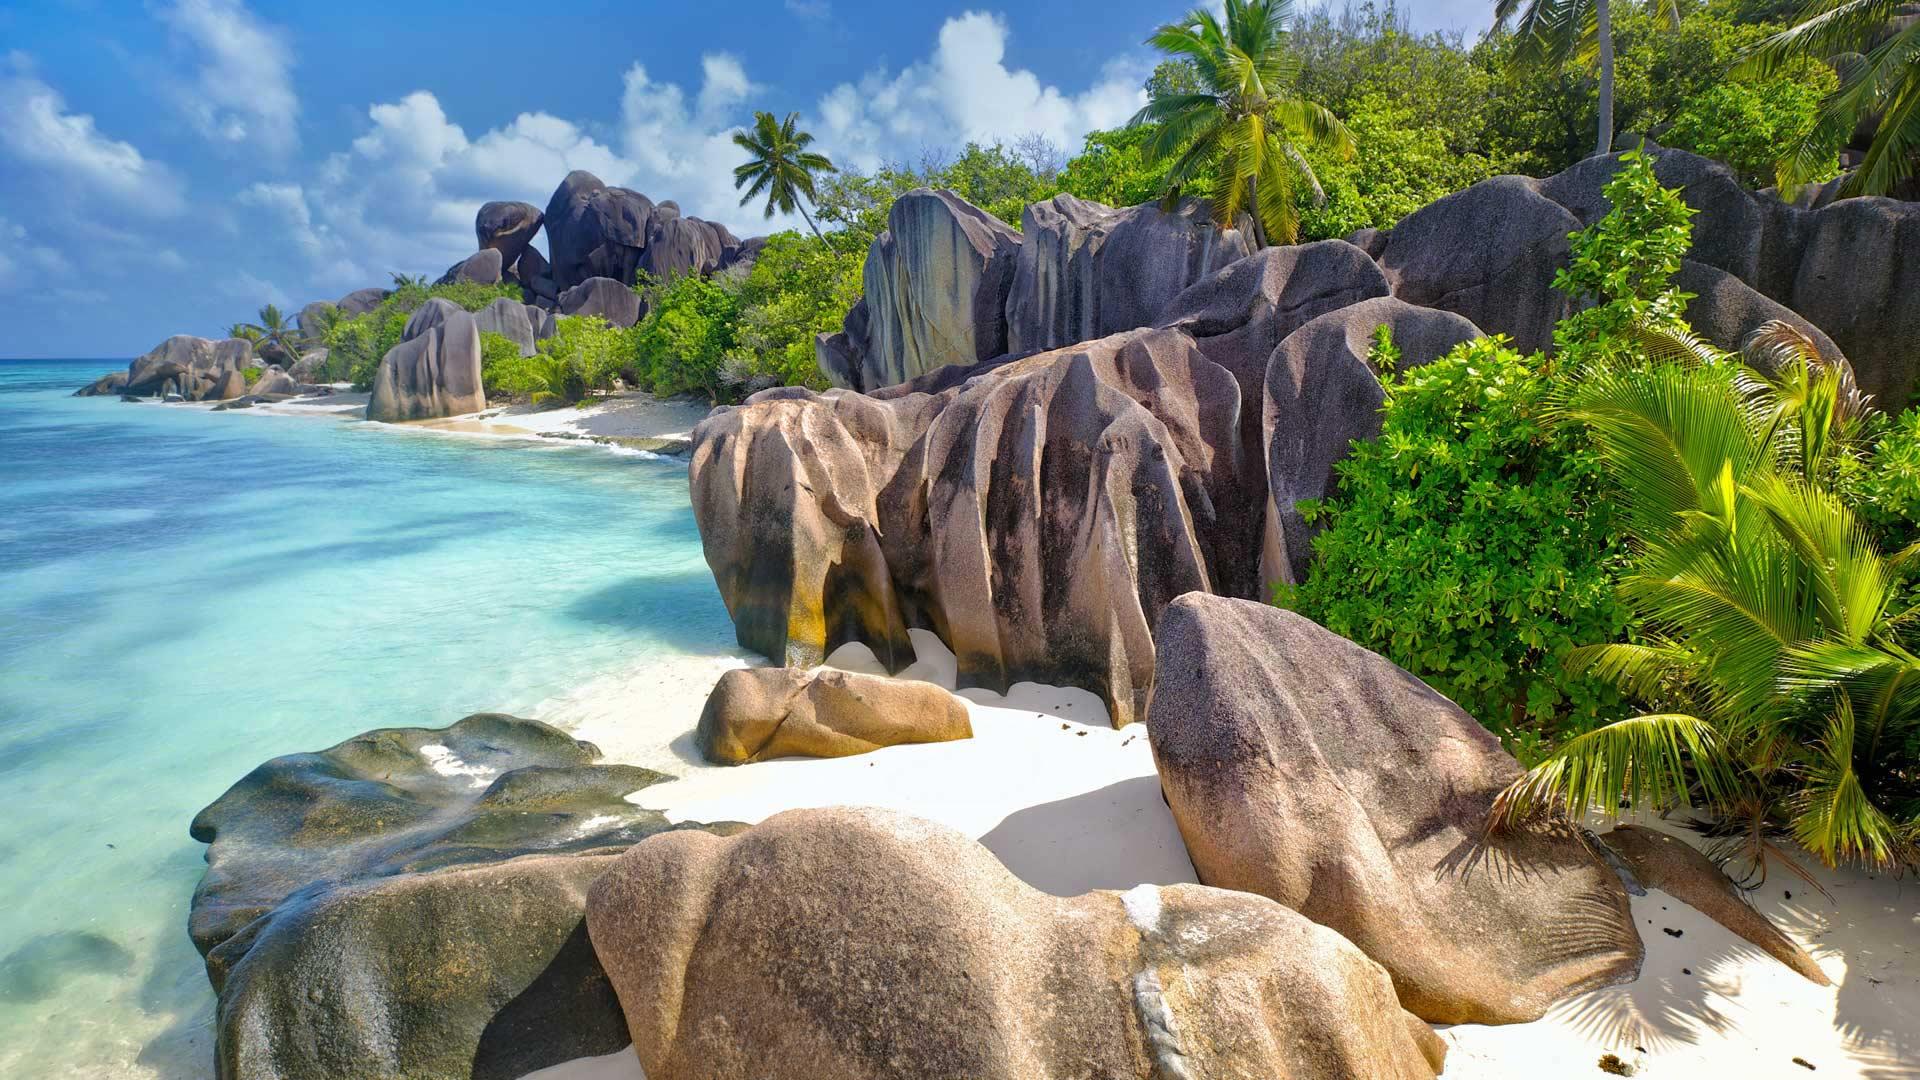 Bing wallpaper - Cozumel Island Coati